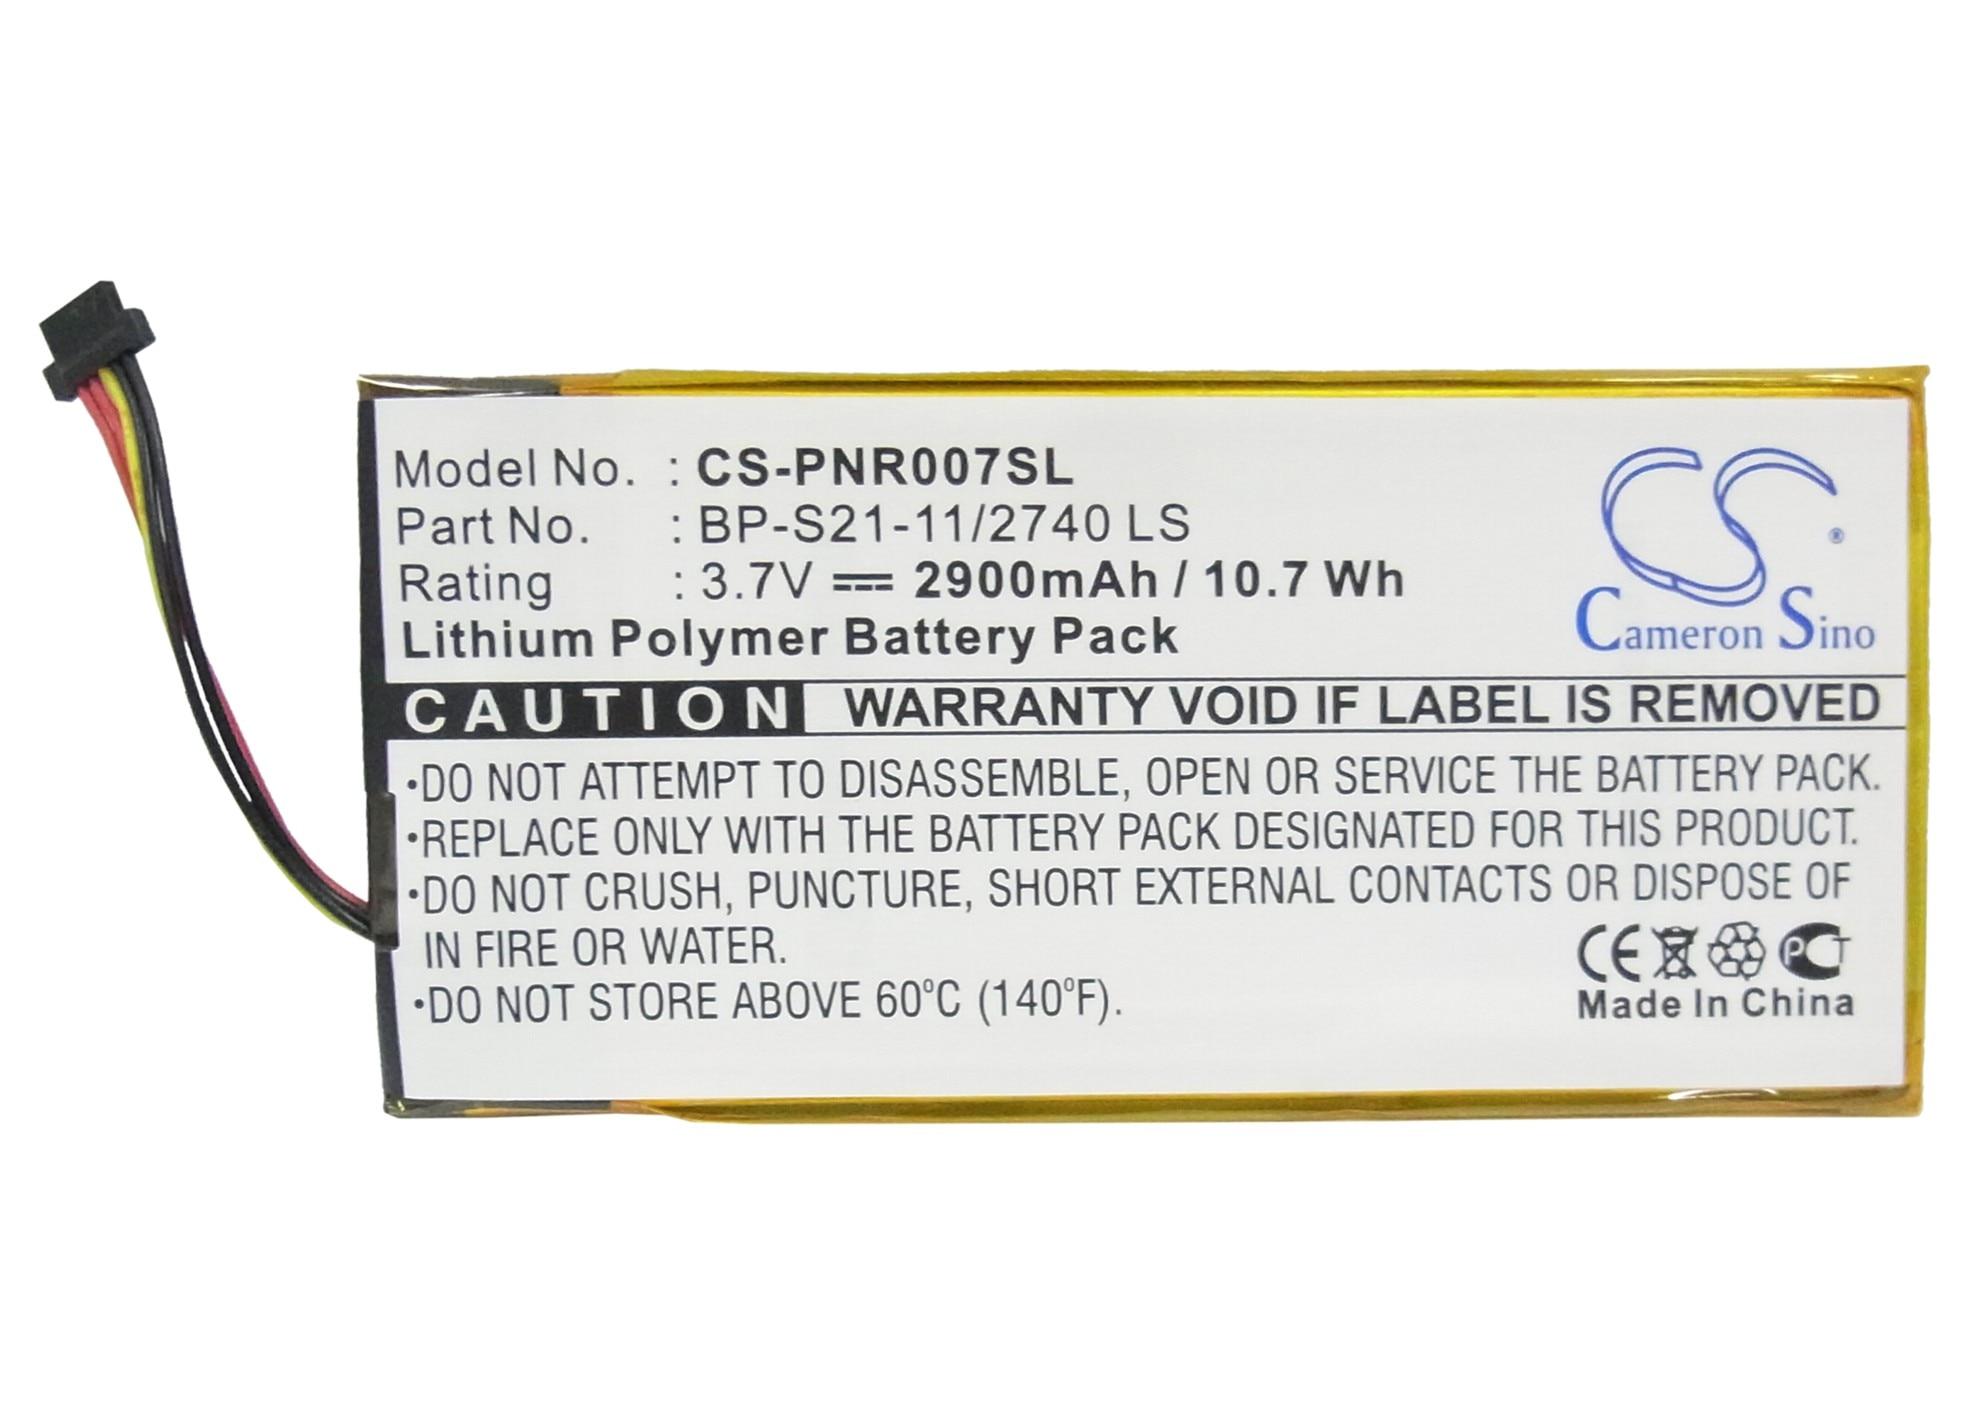 Cameron Sino 2900mAh batería de la batería BP-S21-11/2740 ¿Para Pandigital novela 7 PRD07T20WBL1